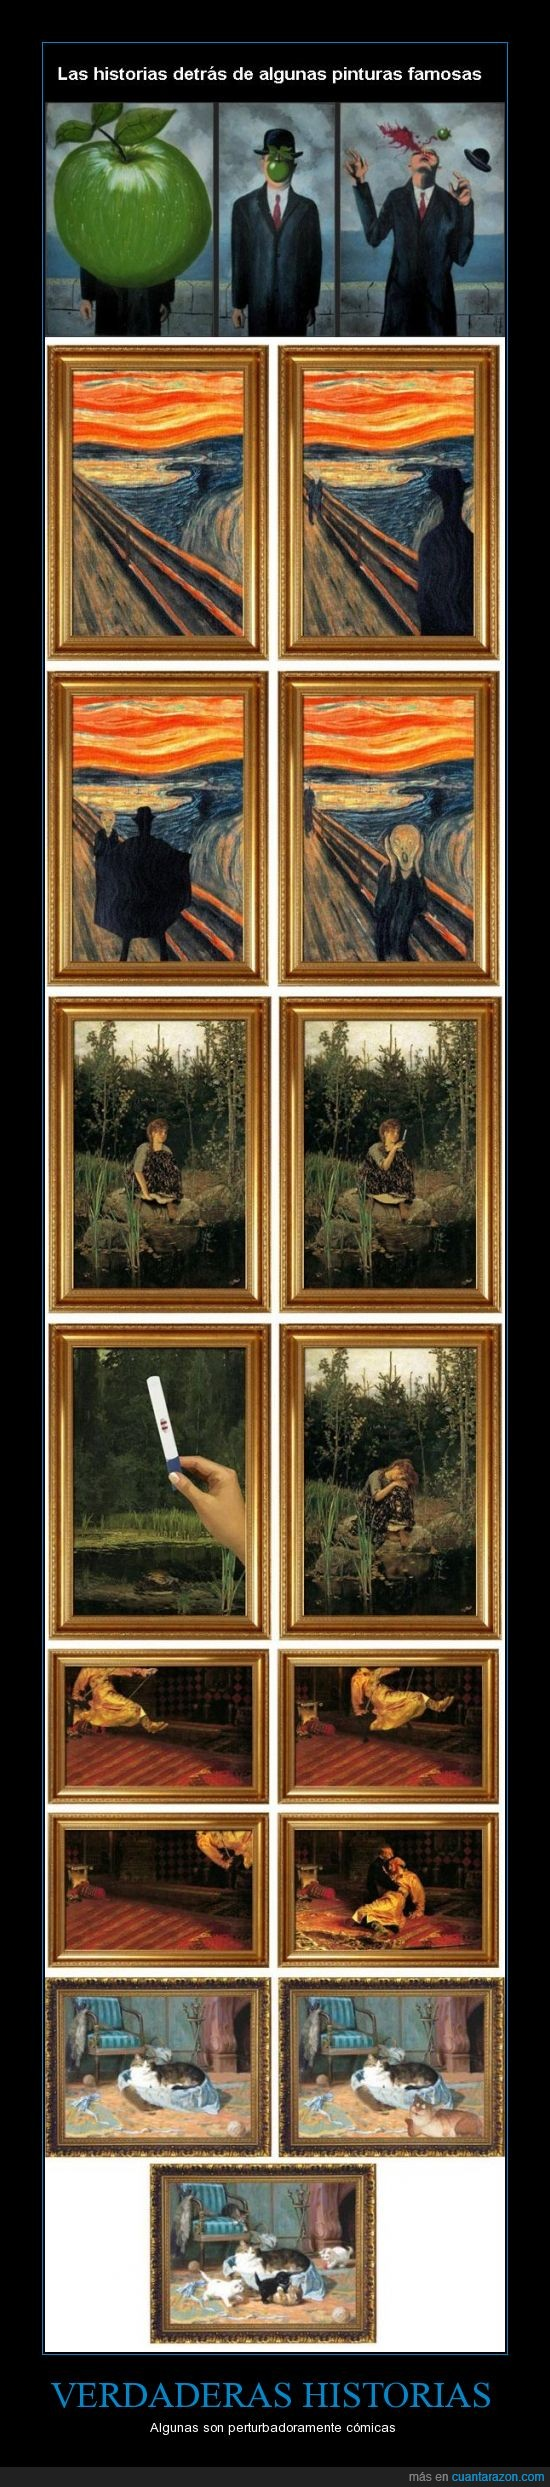 arte,historias,la del grito me ha matado xDD,pinturas,verdaderas